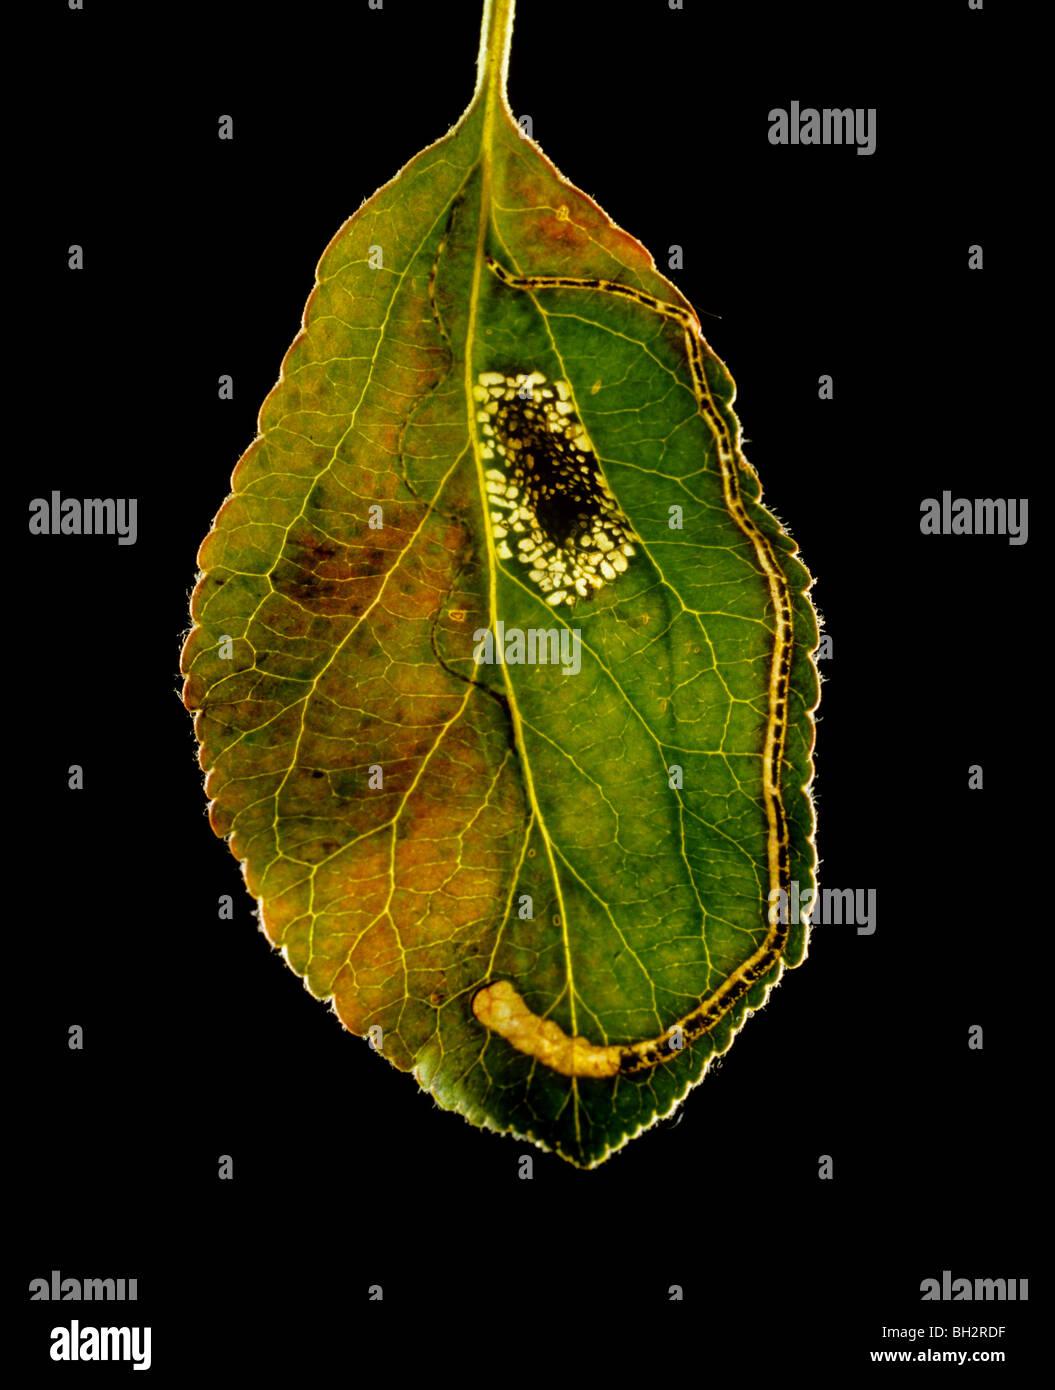 Leaf miner damage to apple leaf with round (Lithocolletis) & long (Lyonetia) mines - Stock Image